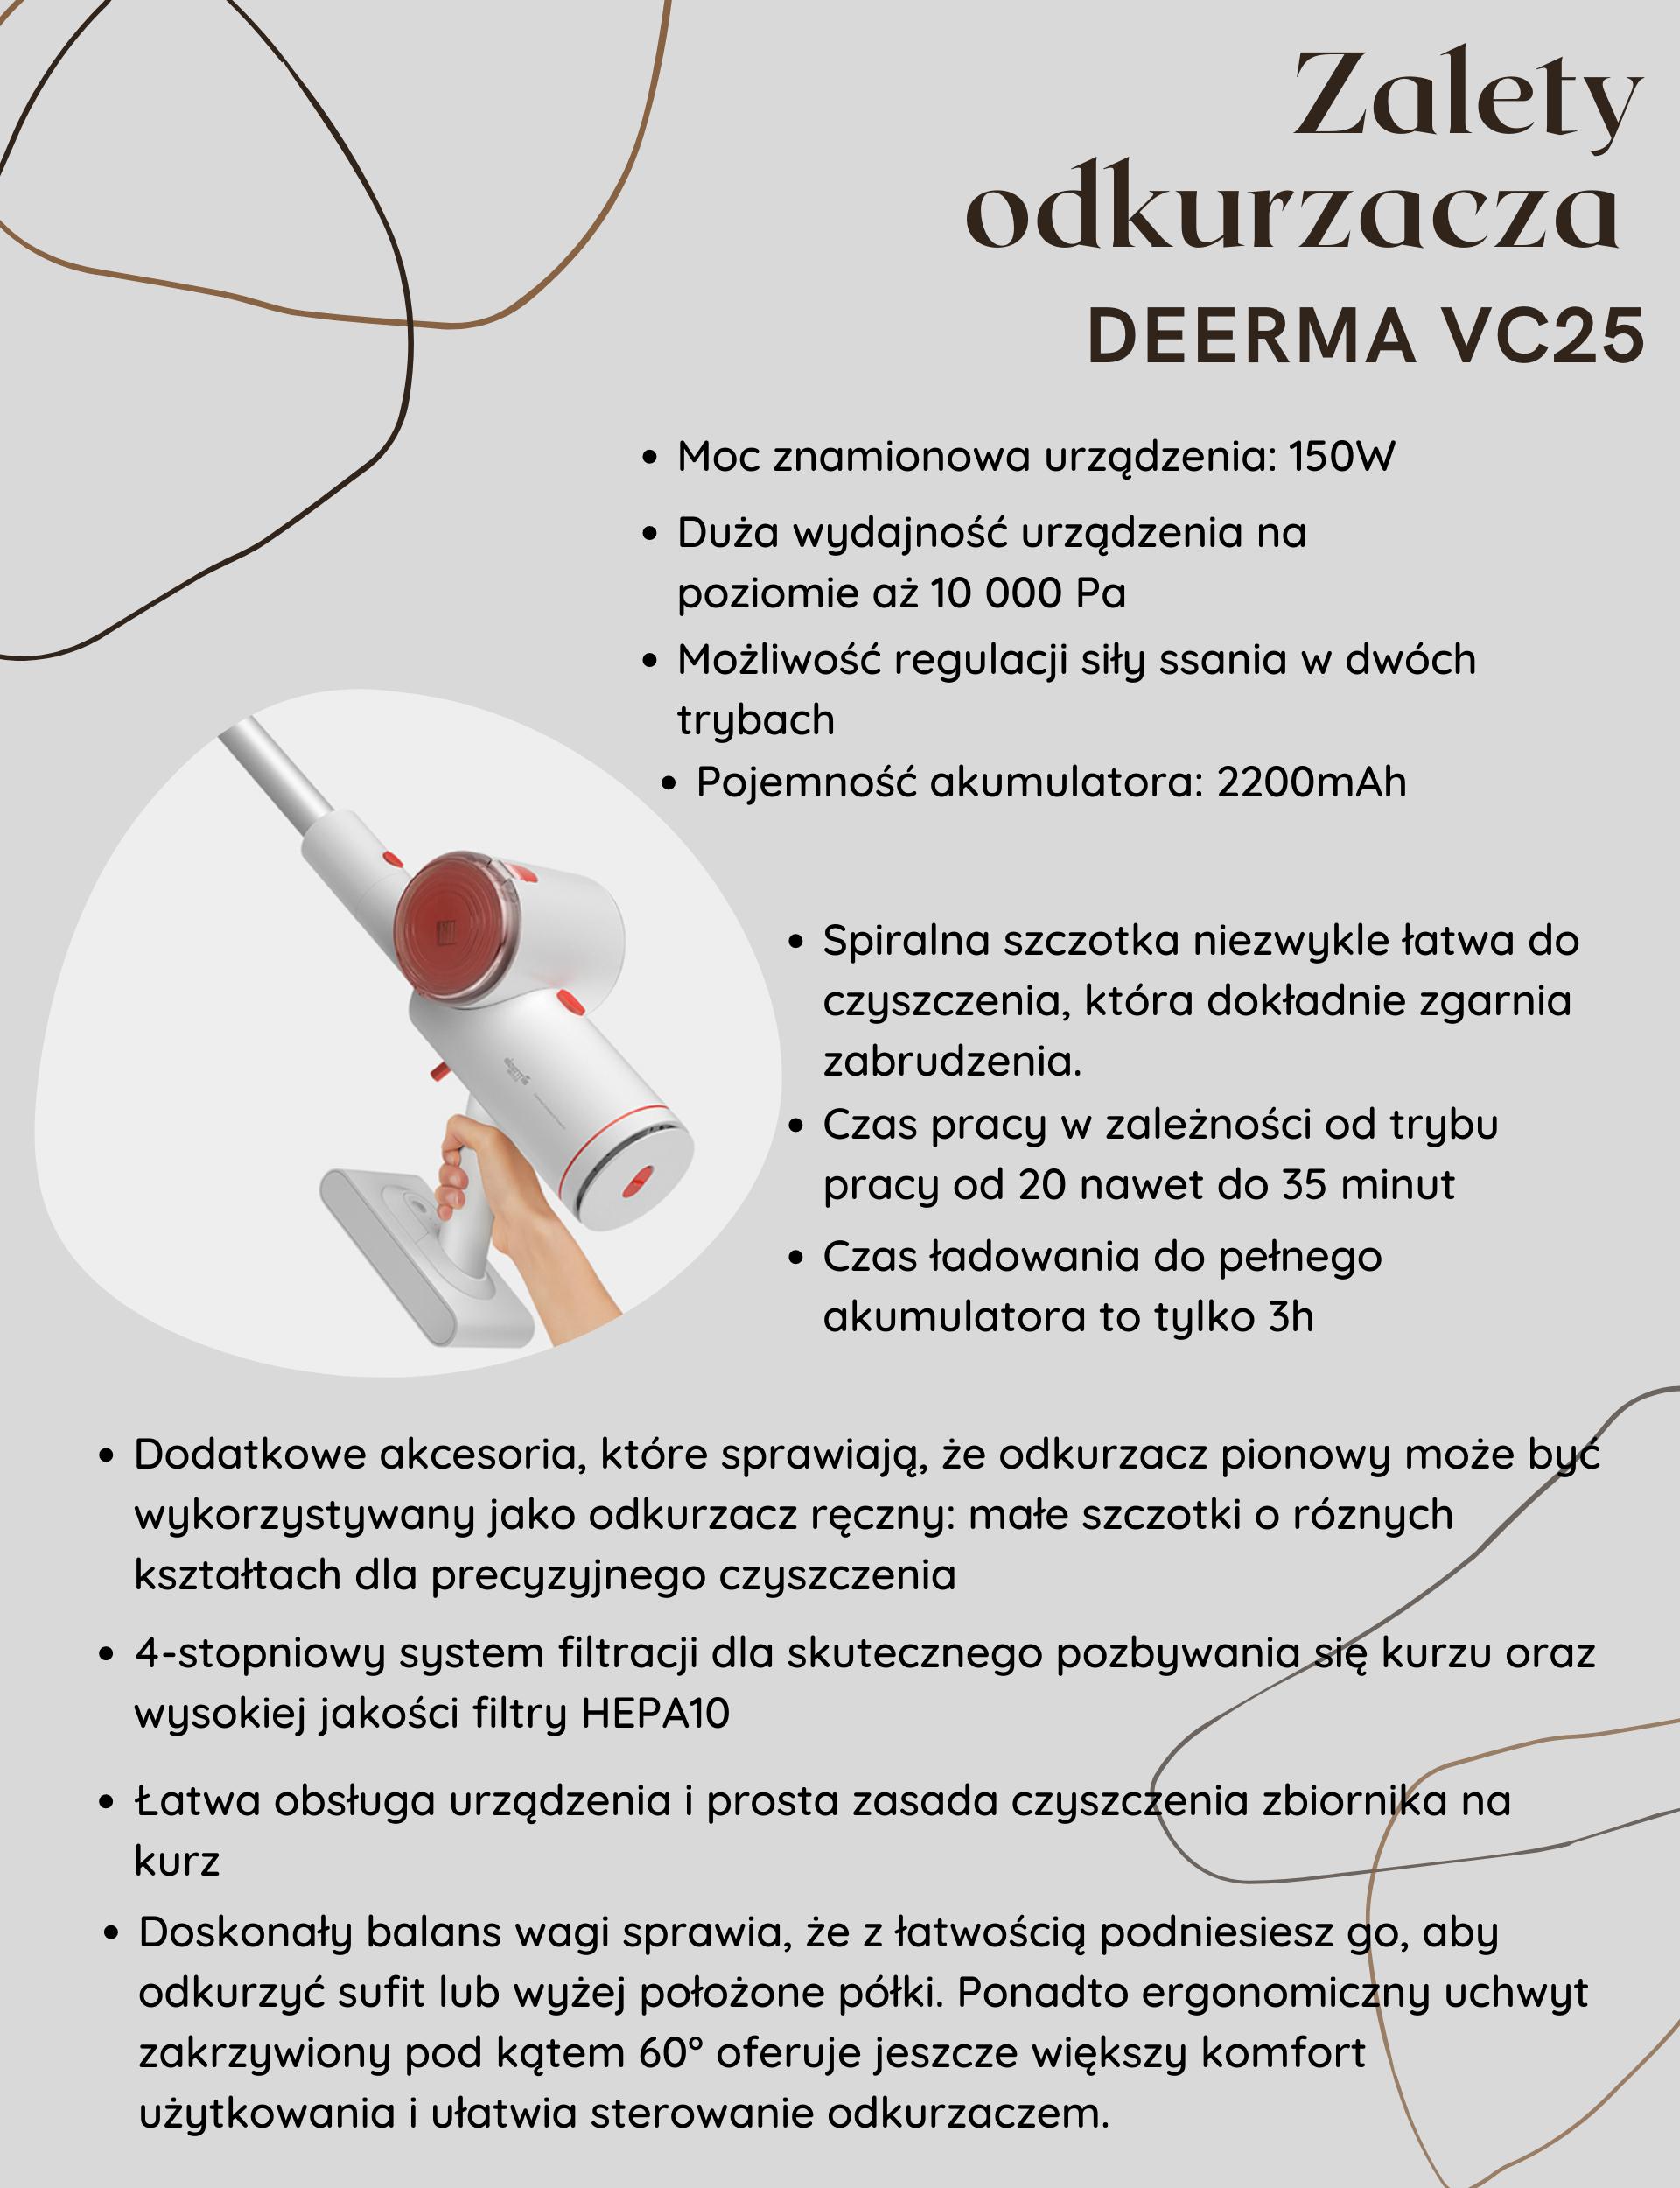 Odkurzacz Deerma VC25 zalety.png